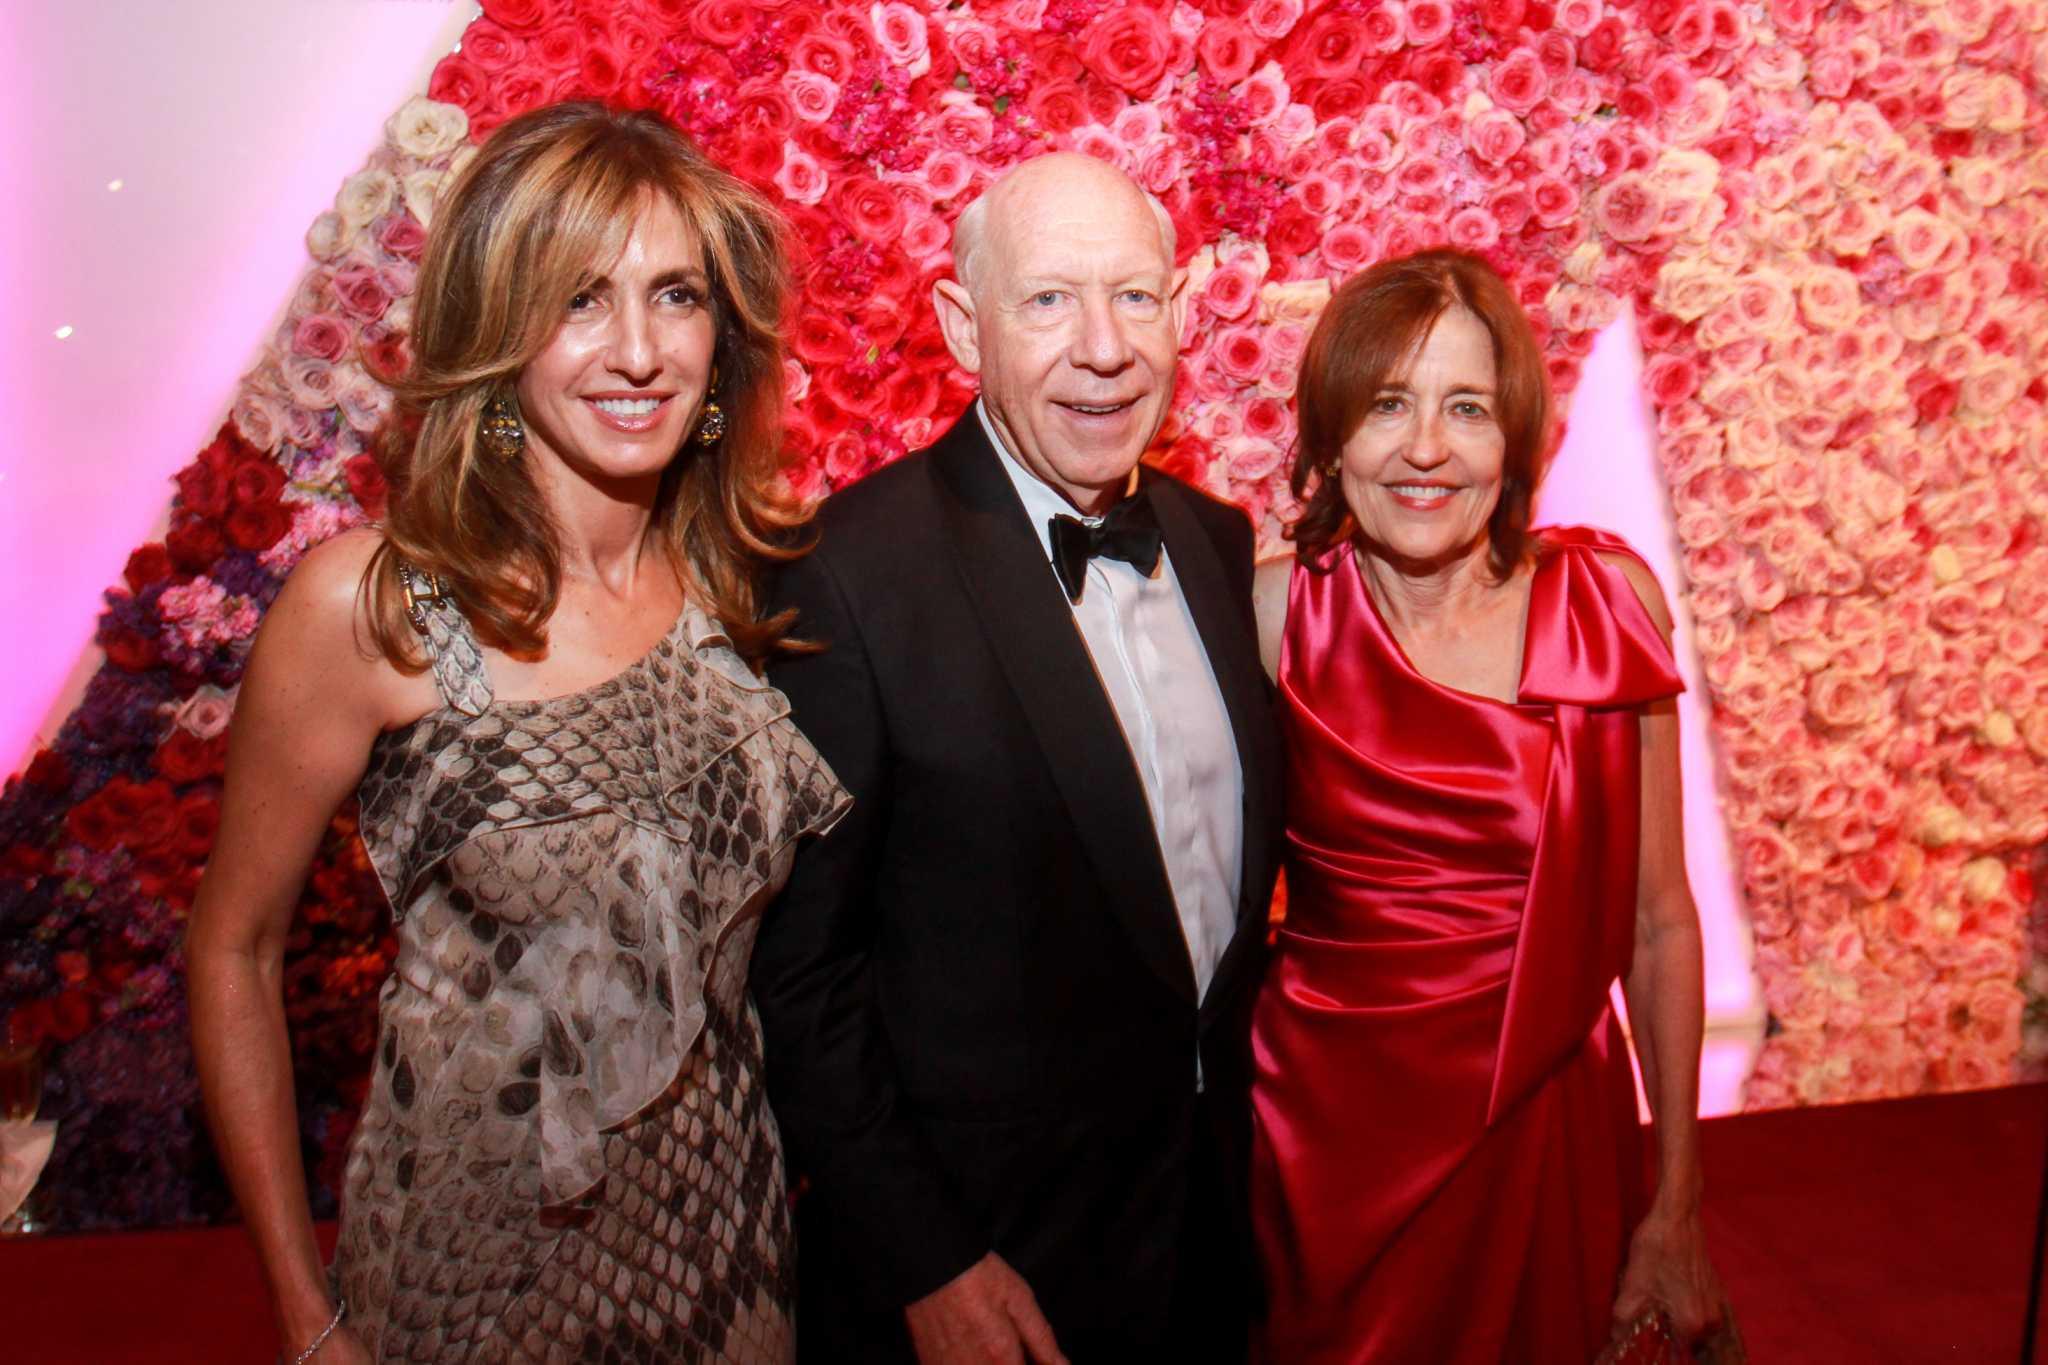 It's a modern, musical world at Museum of Fine Arts, Houston's $1.9 million Grand Gala Ball